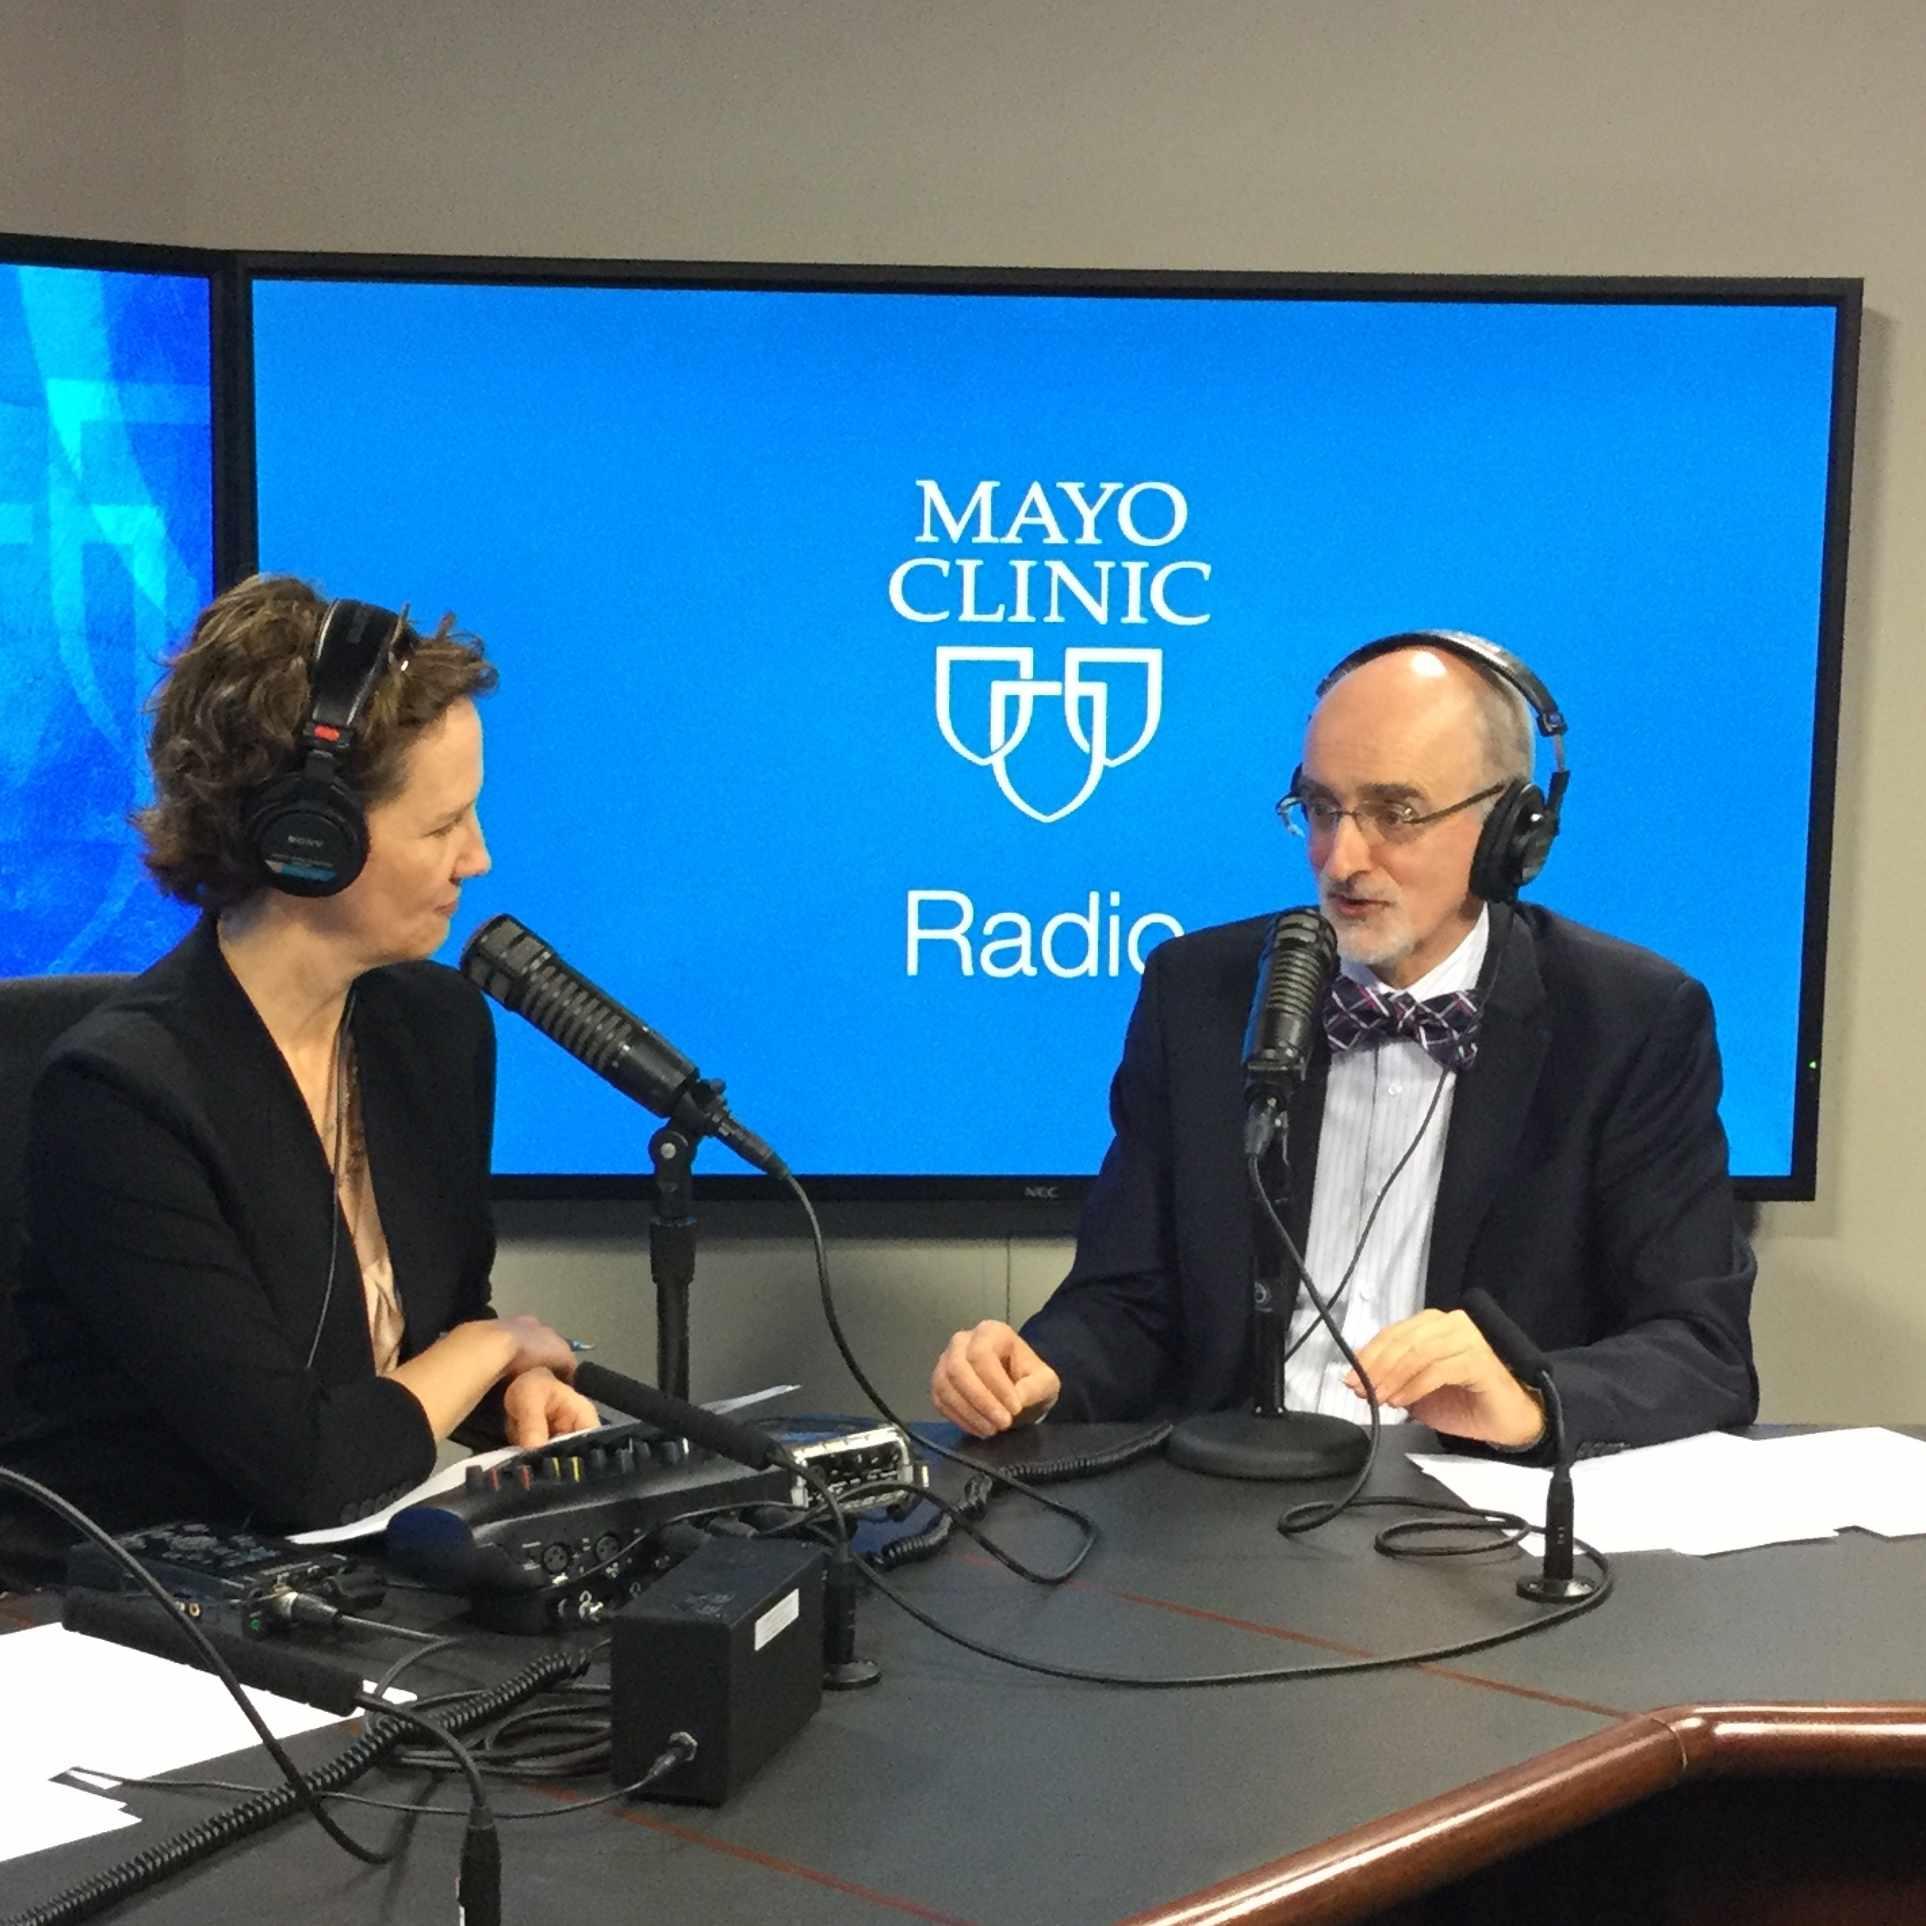 Dr. Joseph Murray being interviewed on Mayo Clinic Radio